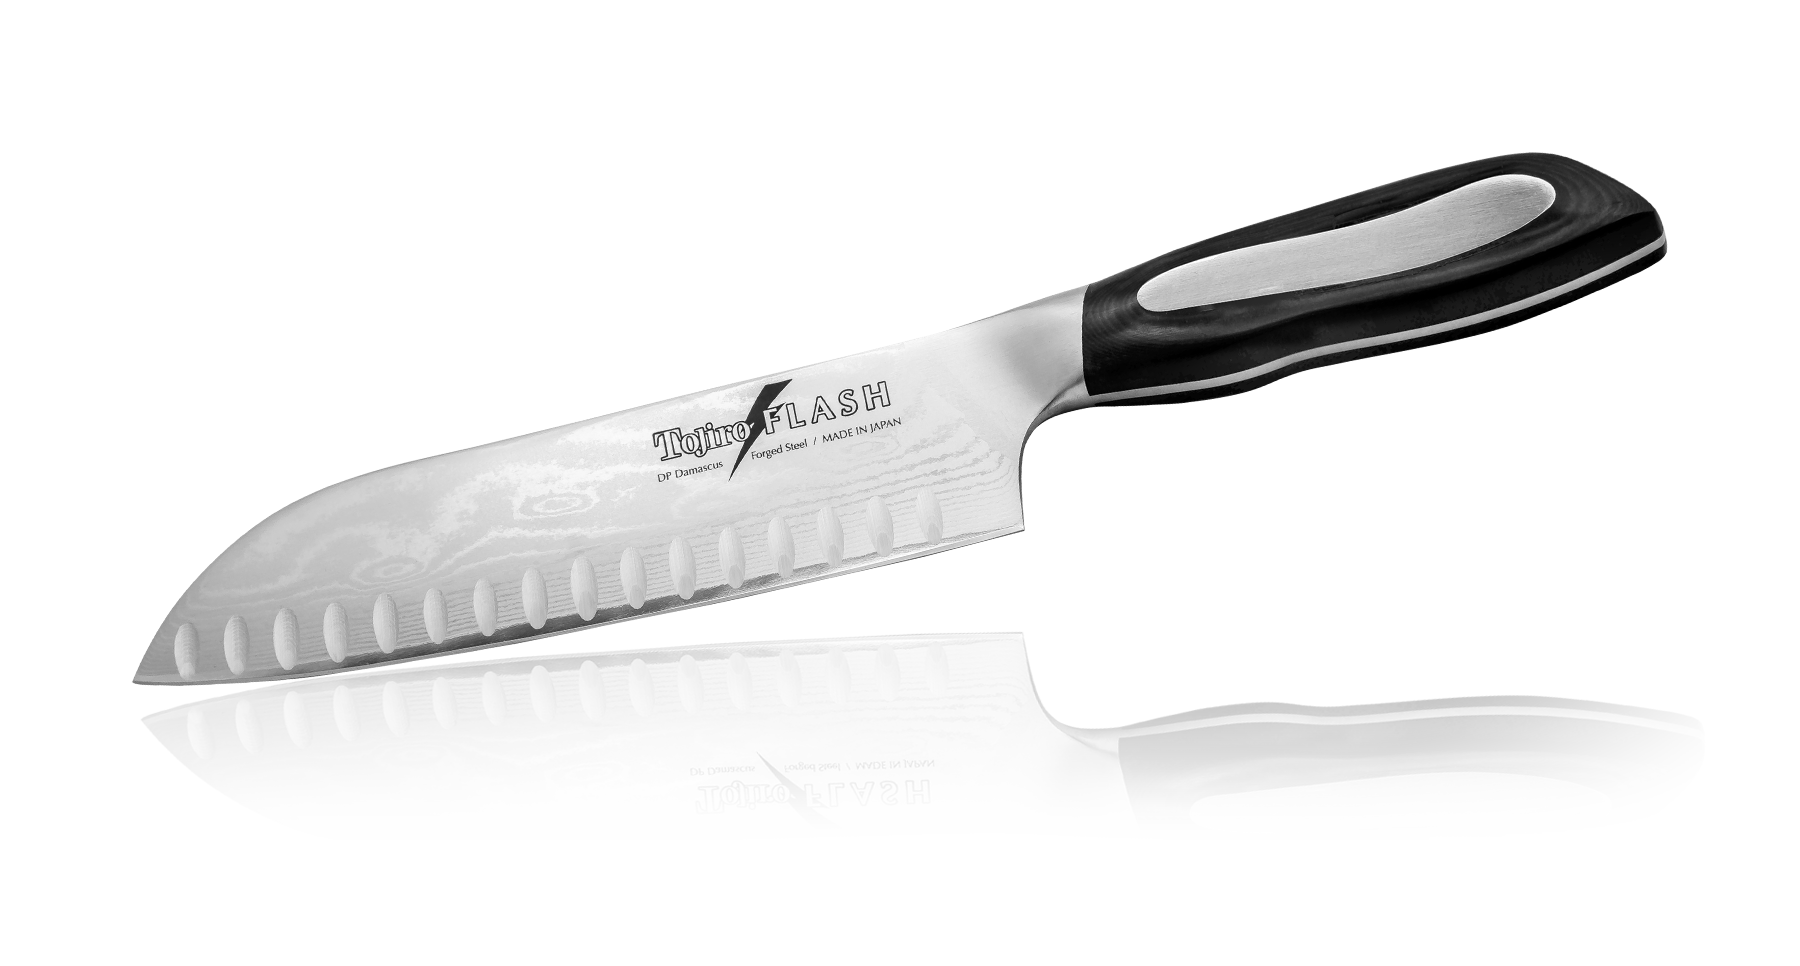 Нож Сантоку Tojiro Flash 180 мм с насечками, сталь VG-10 цена и фото